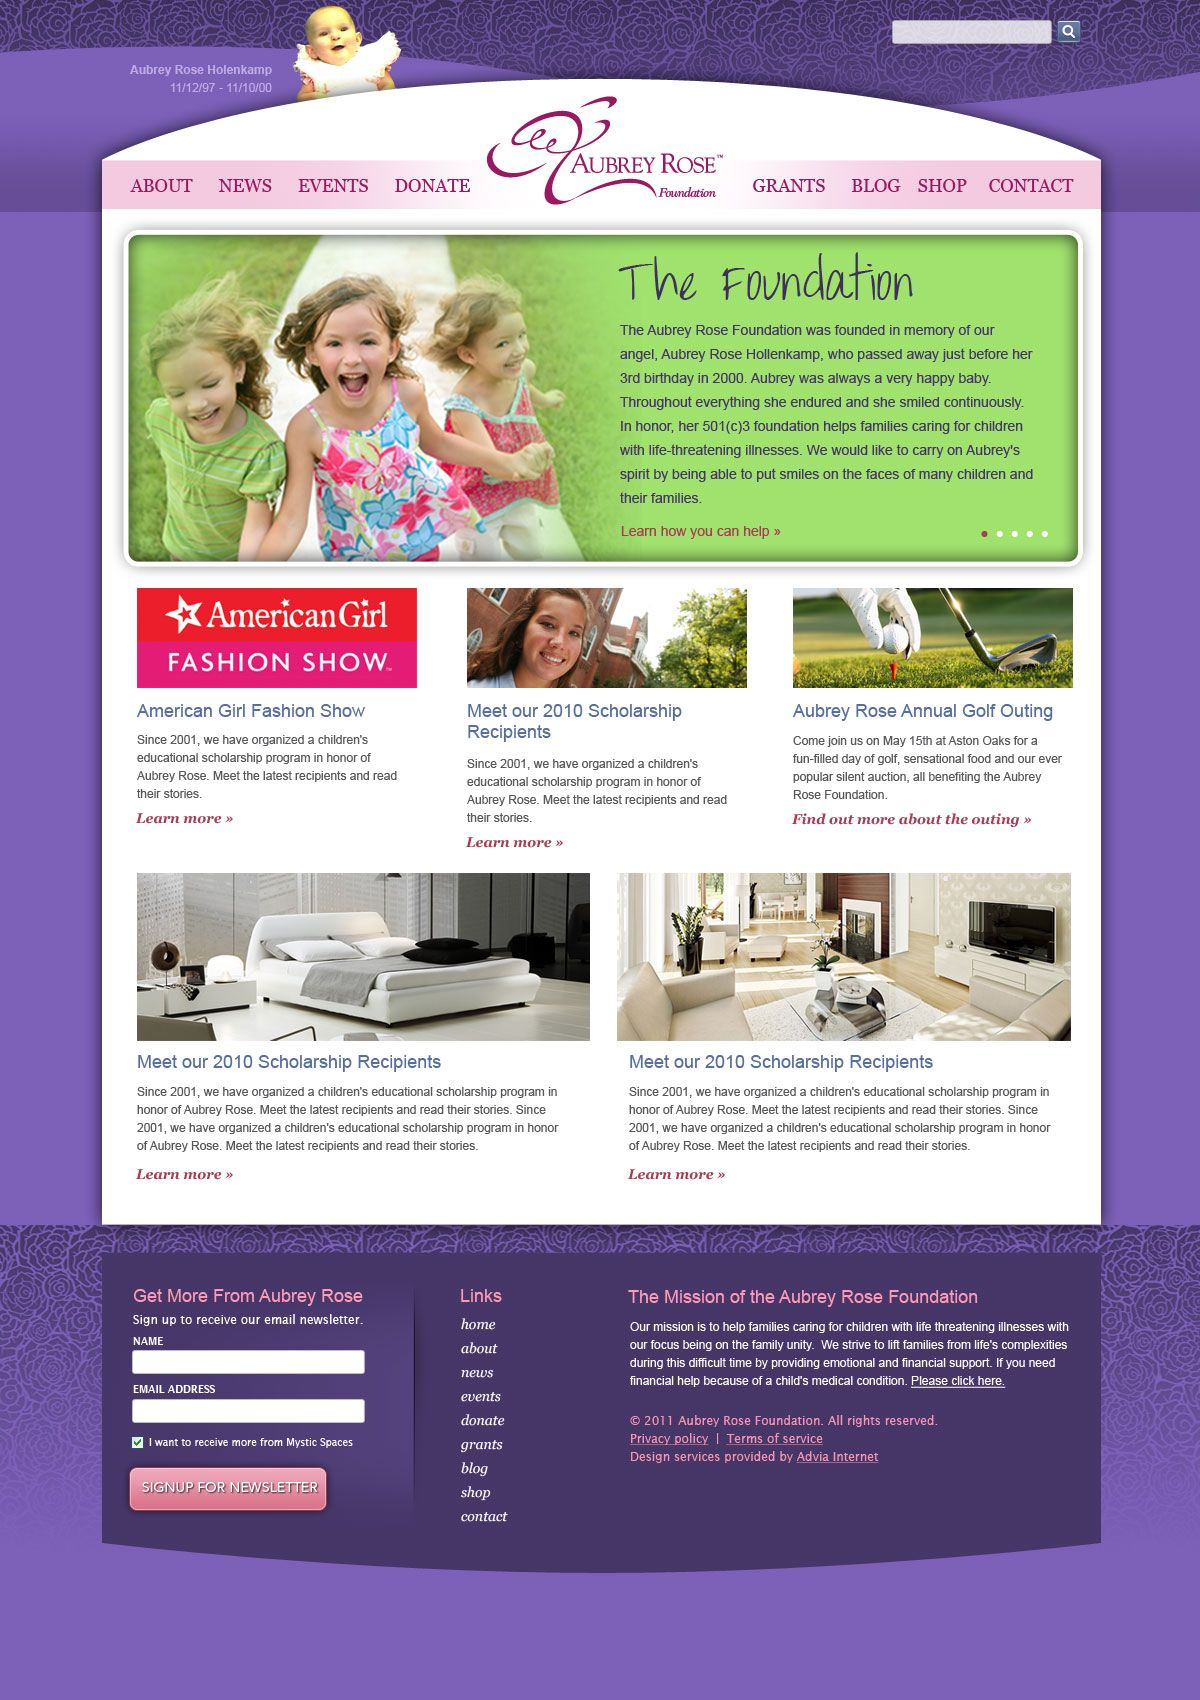 Aubrey Rose Foundation A Cincinnati Ohio Based Non Profit Website Redesign Nonprofit Webdesign Cincinnati Ohio Nonprofit Website Design Web Design